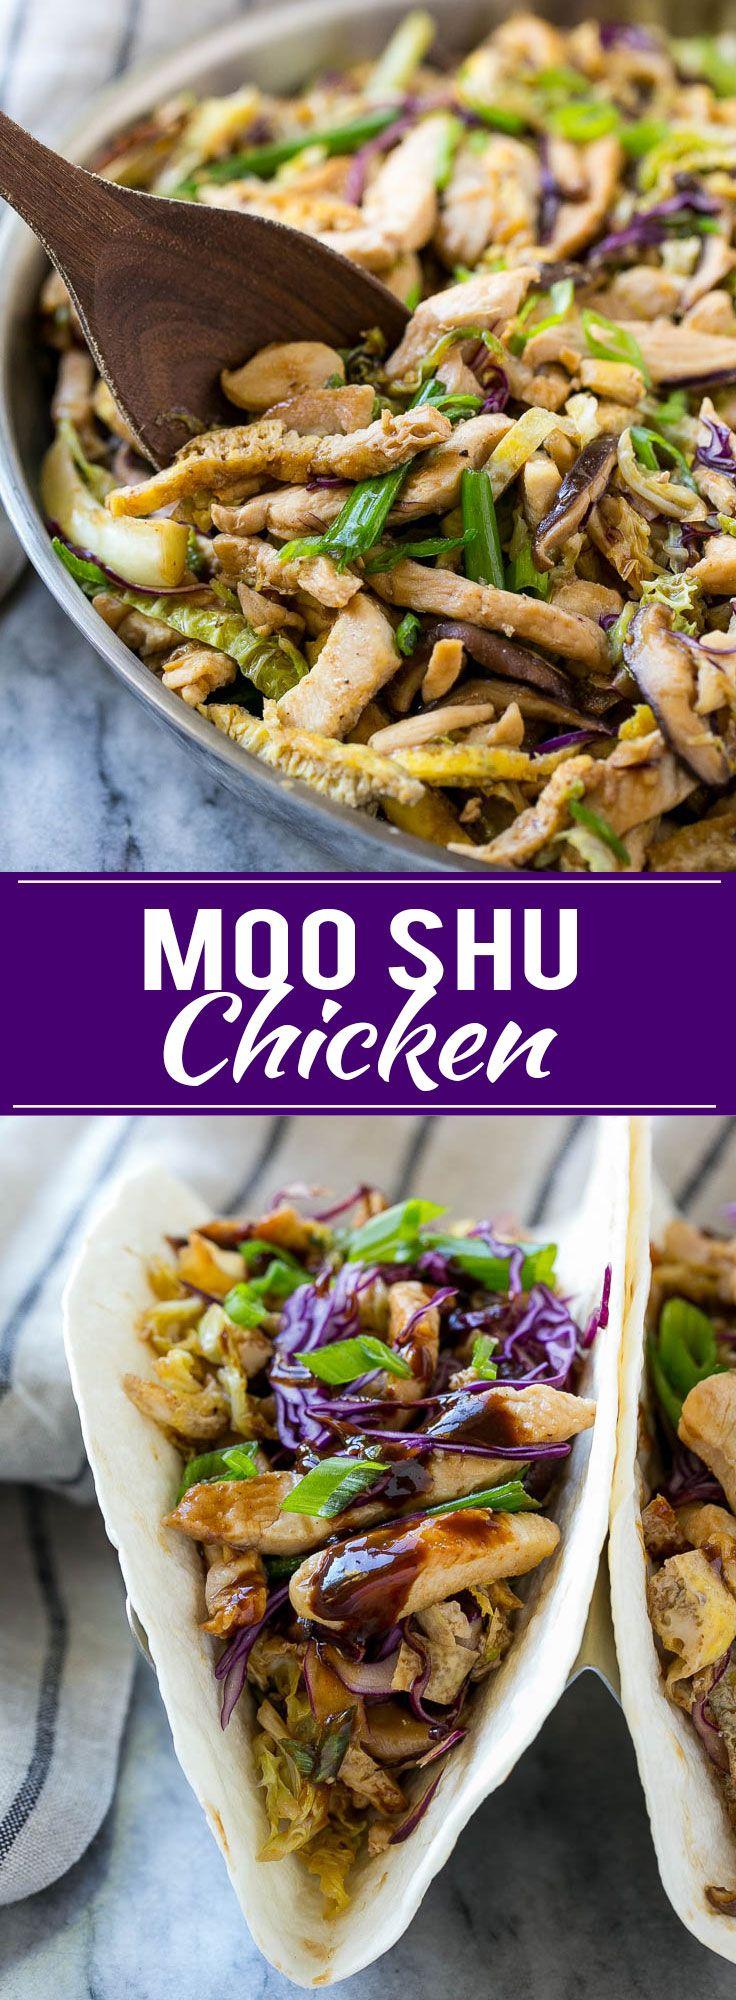 Moo shu chicken recipe chinese food recipe easy chicken recipe moo shu chicken recipe chinese food recipe easy chicken recipe healthy chicken recipe forumfinder Images